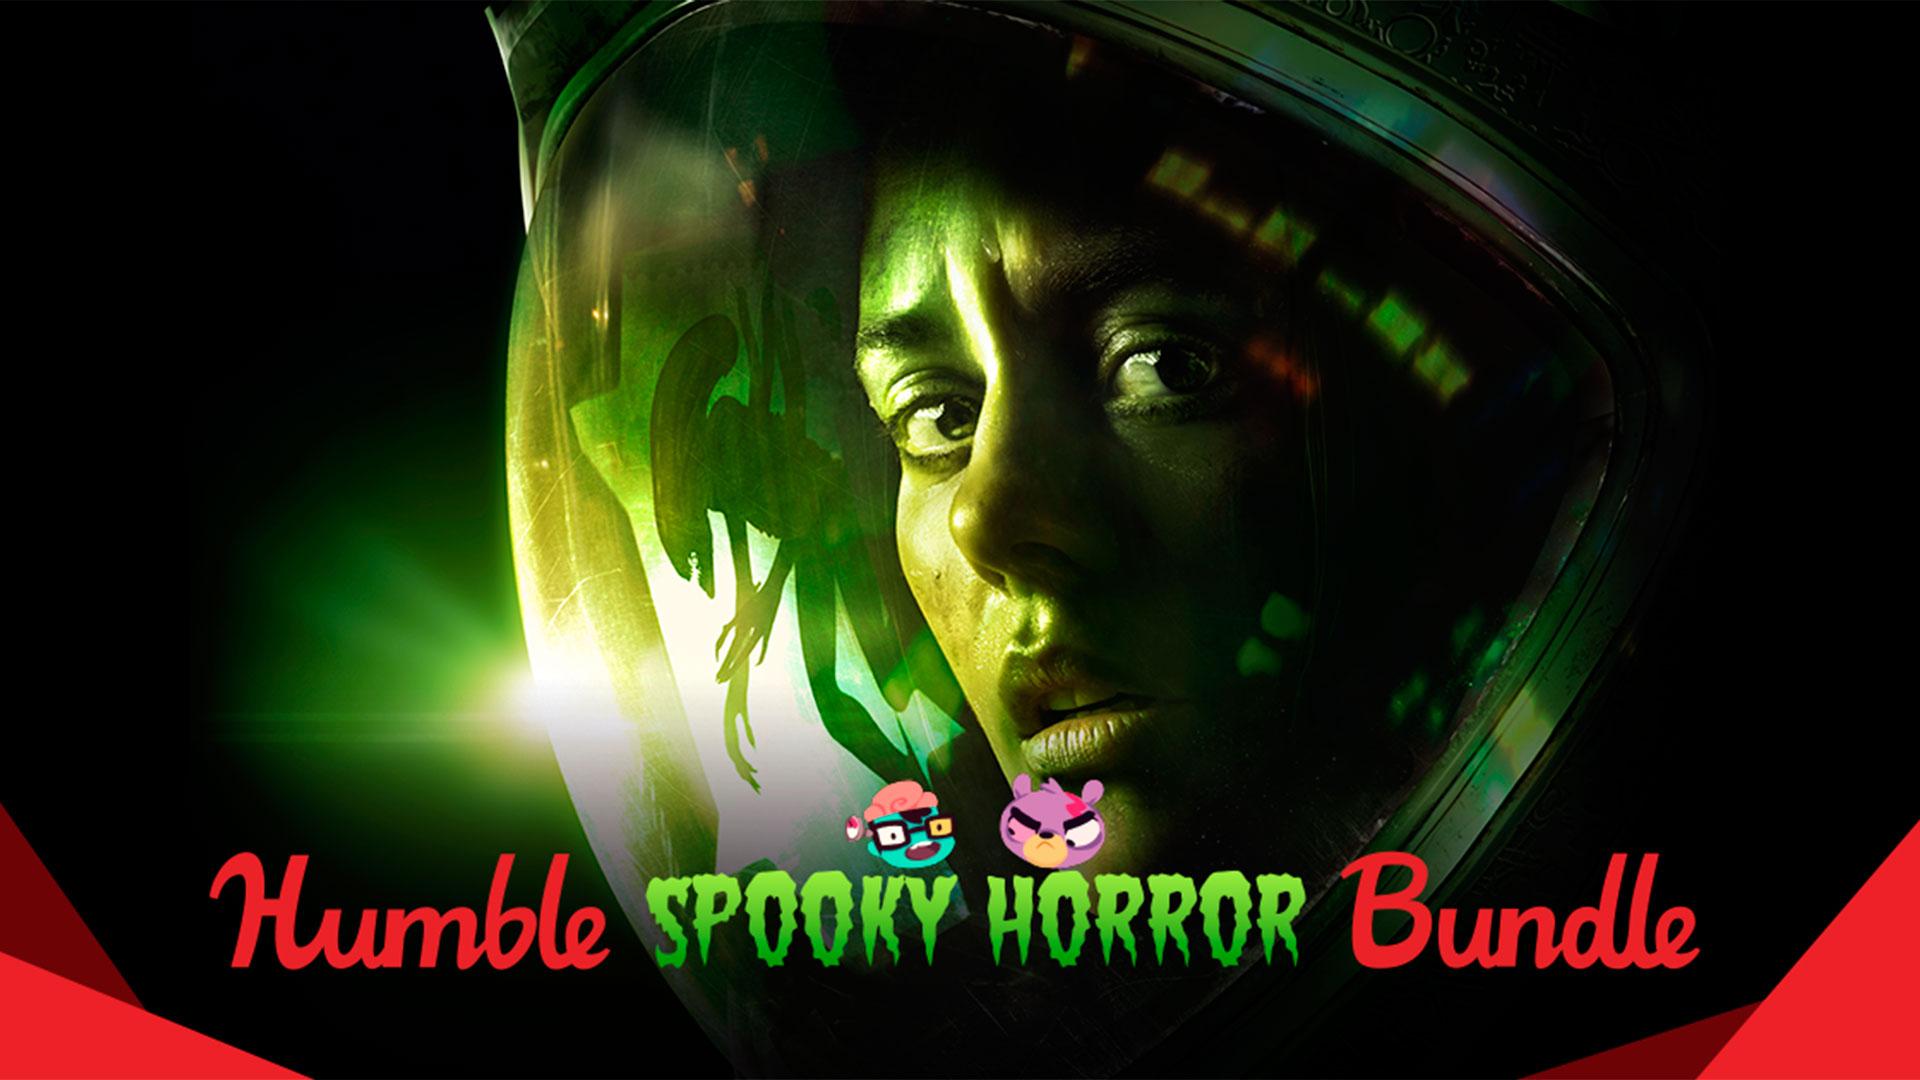 Humble Spooky Horror Bundle